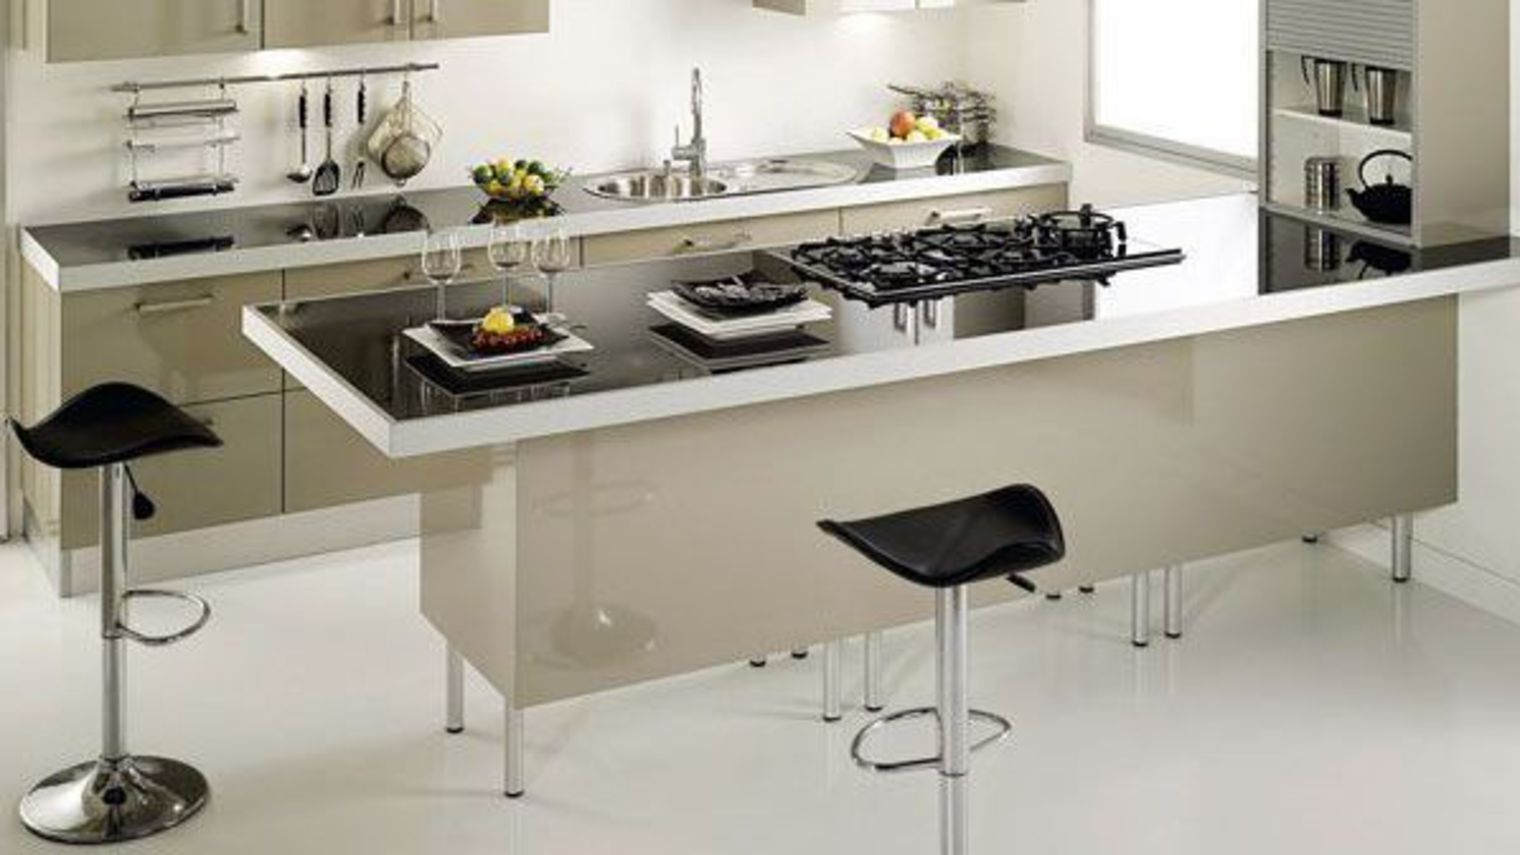 Plan de travail cuisine leroy merlin lille maison - Plan de travail cuisine stratifie leroy merlin ...